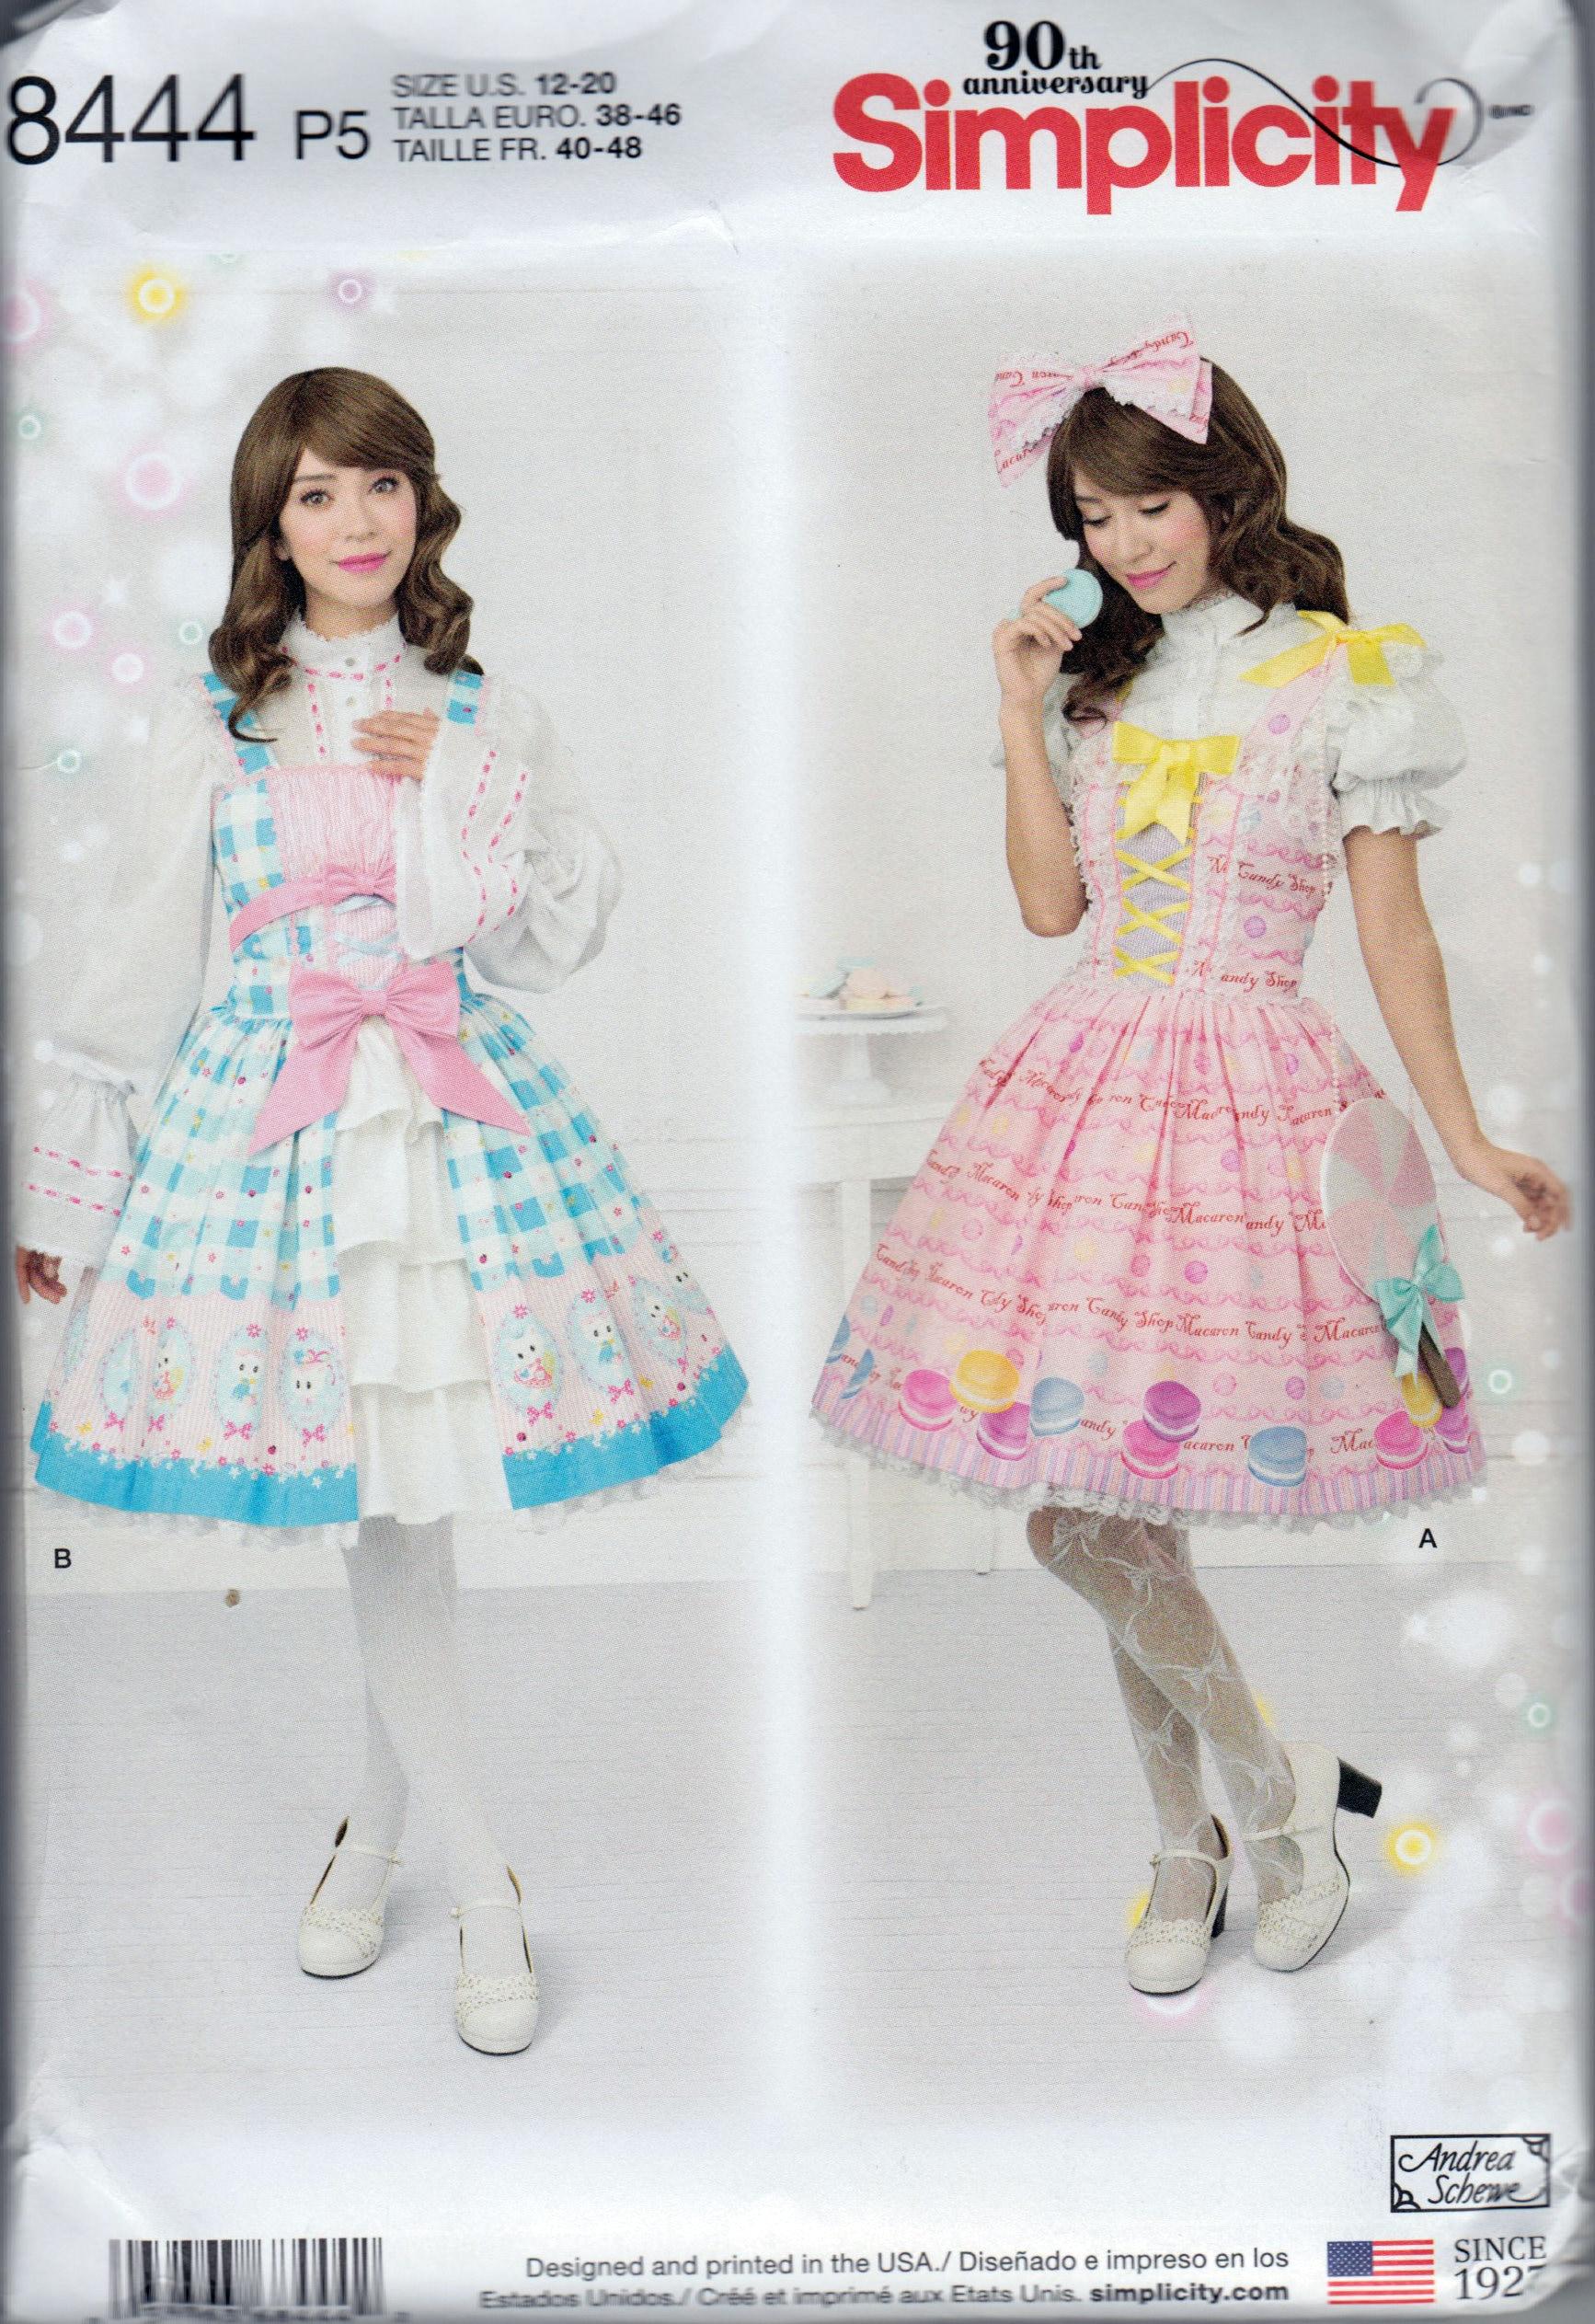 Gotische Lolita Harajuku Kleid Schnittmuster Rock 2 Kleider